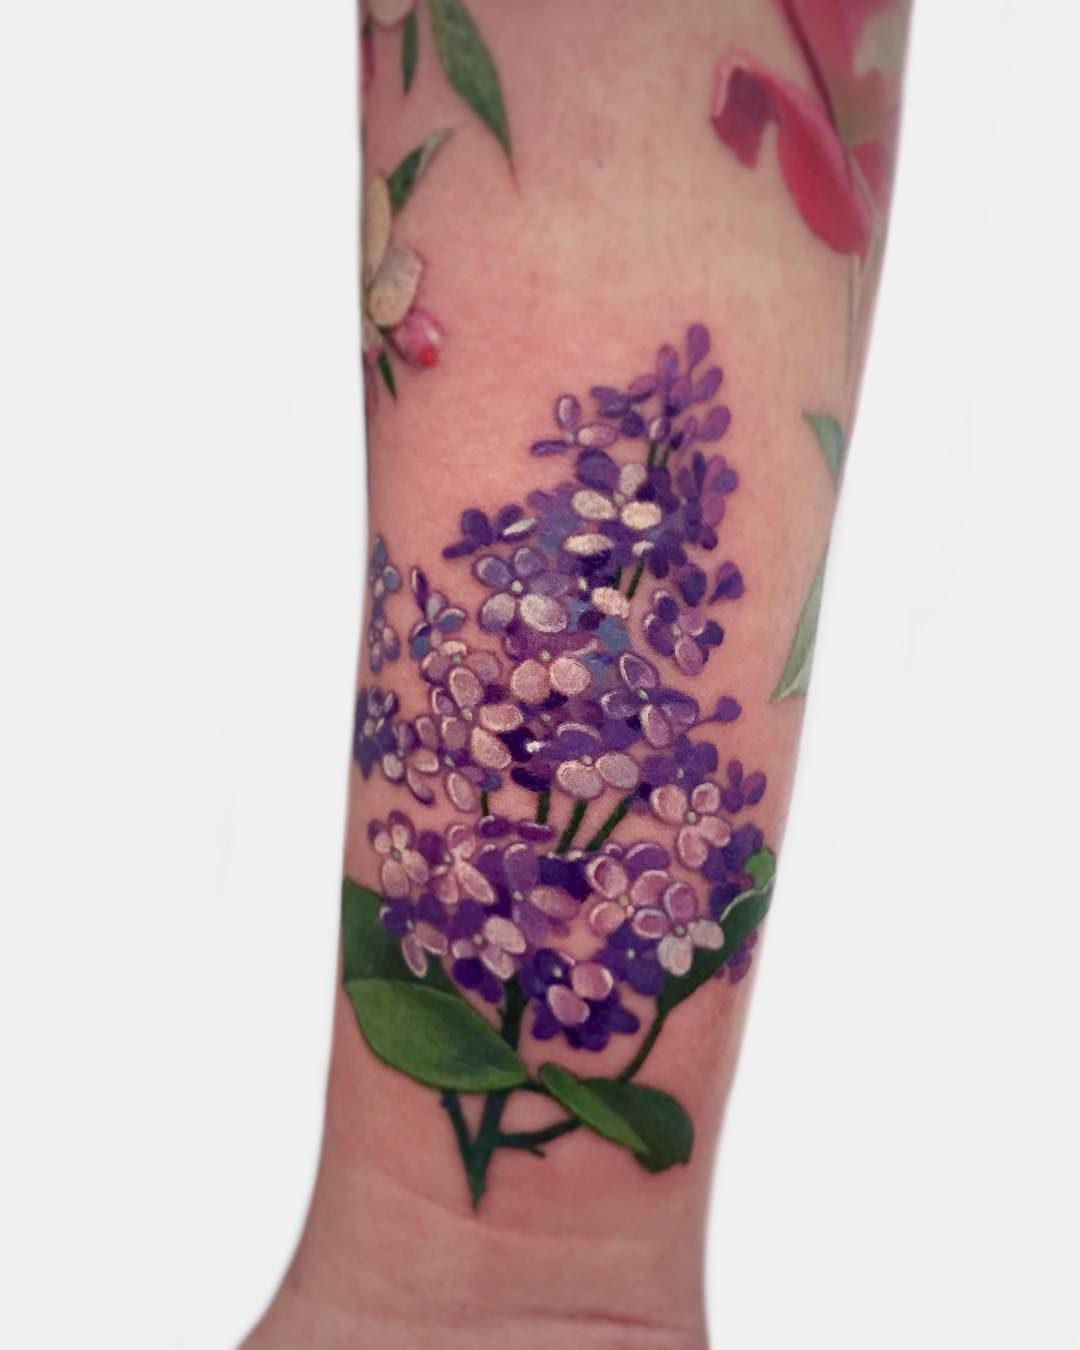 Tenderness in tattoos by Janice Bao Bao